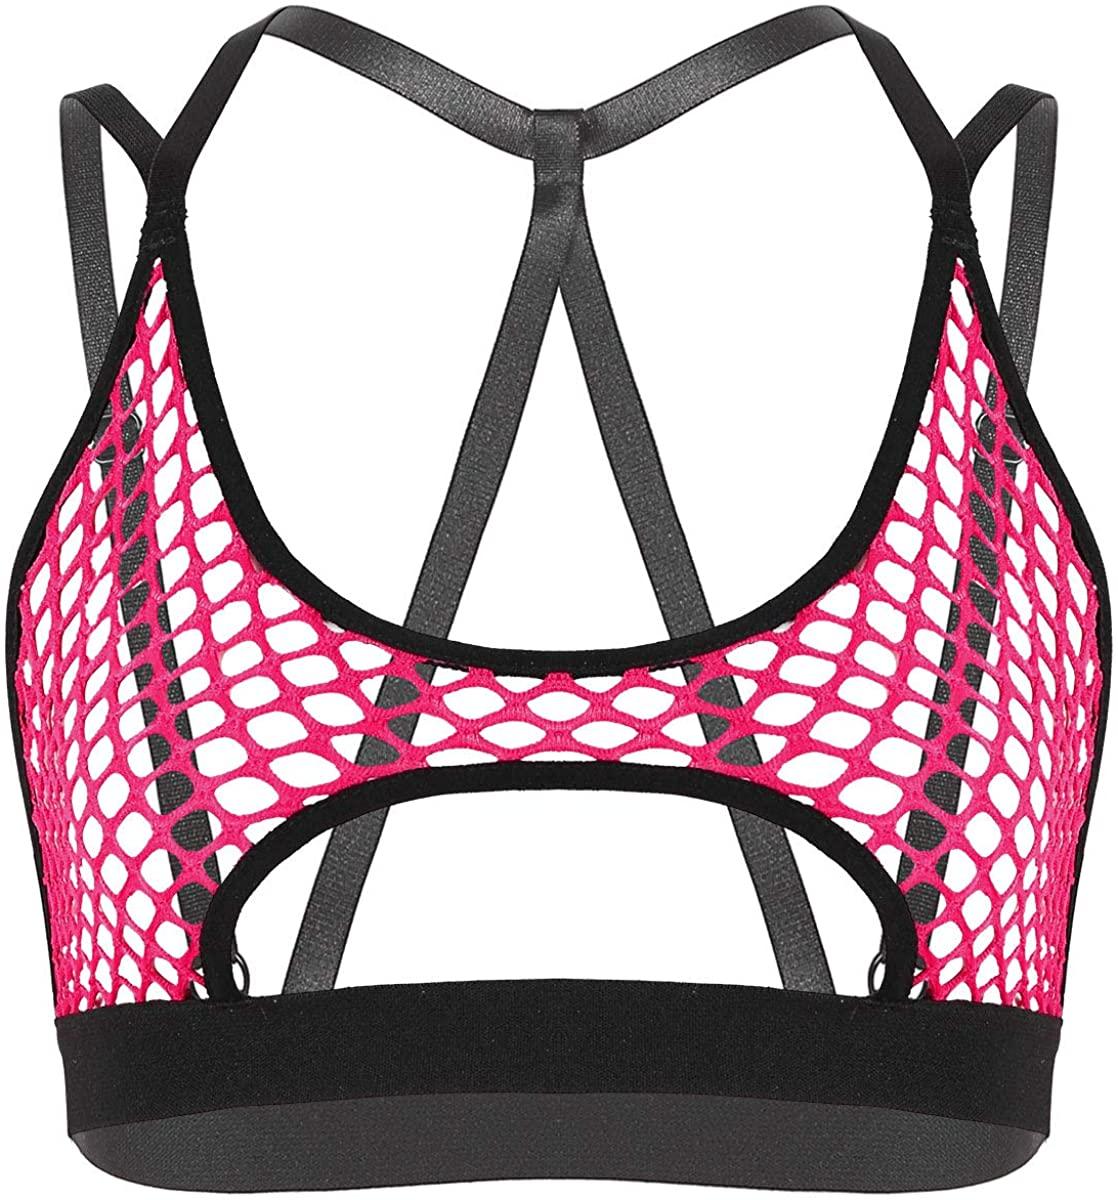 Alvivi Women's Strappy Fishnet Mesh Bra Camisole Halter Neck Cut-Out Stretchy Crop Tops Swimwear